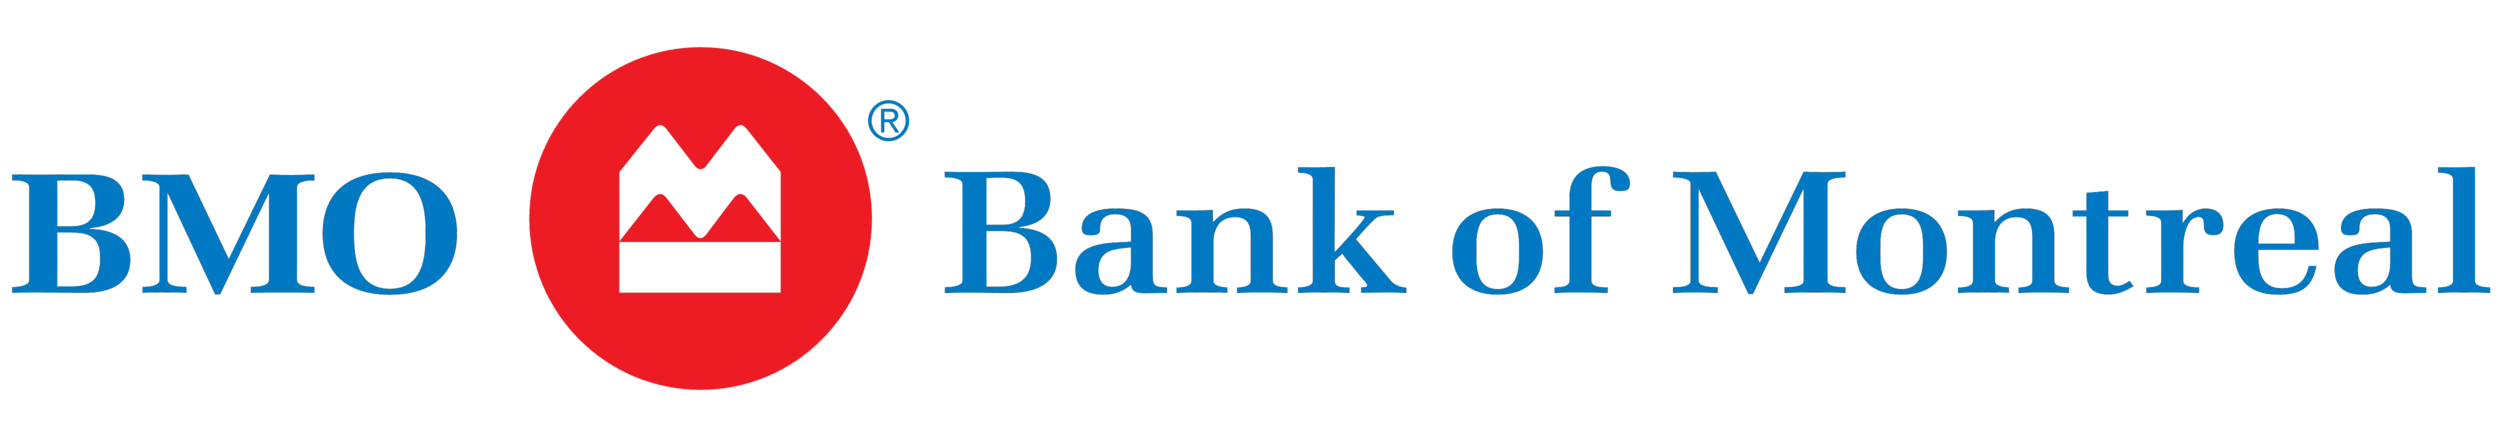 BMO_logo_Bank_of_Montreal.png